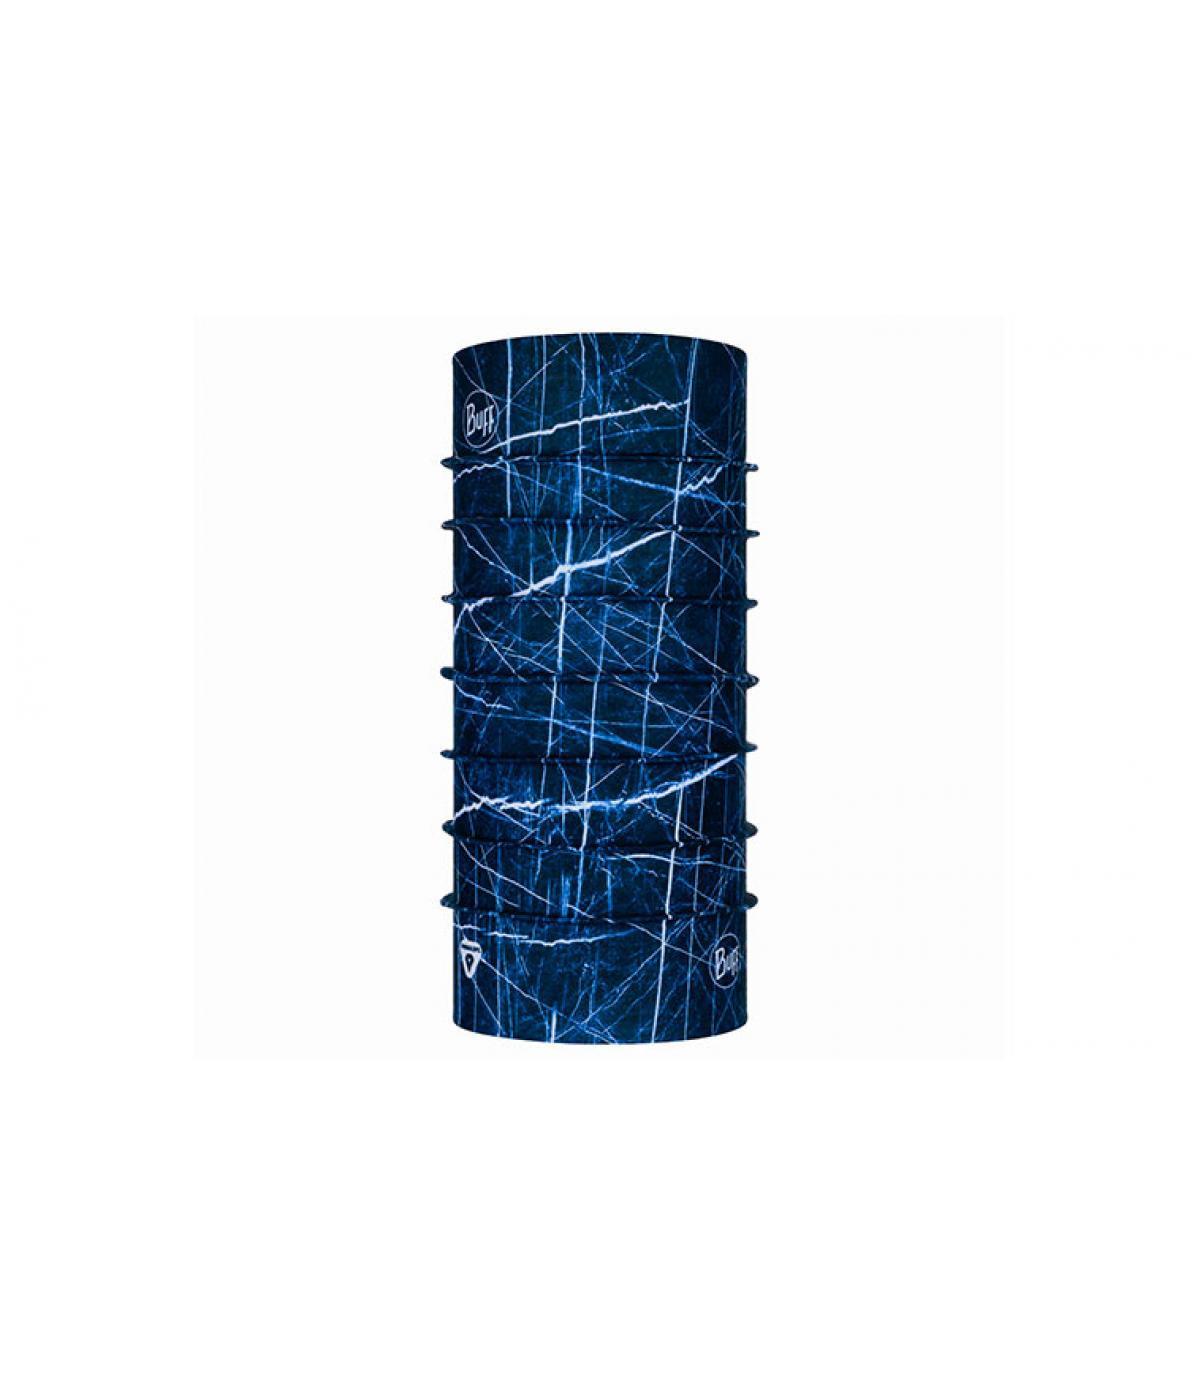 Buff stampato in blu